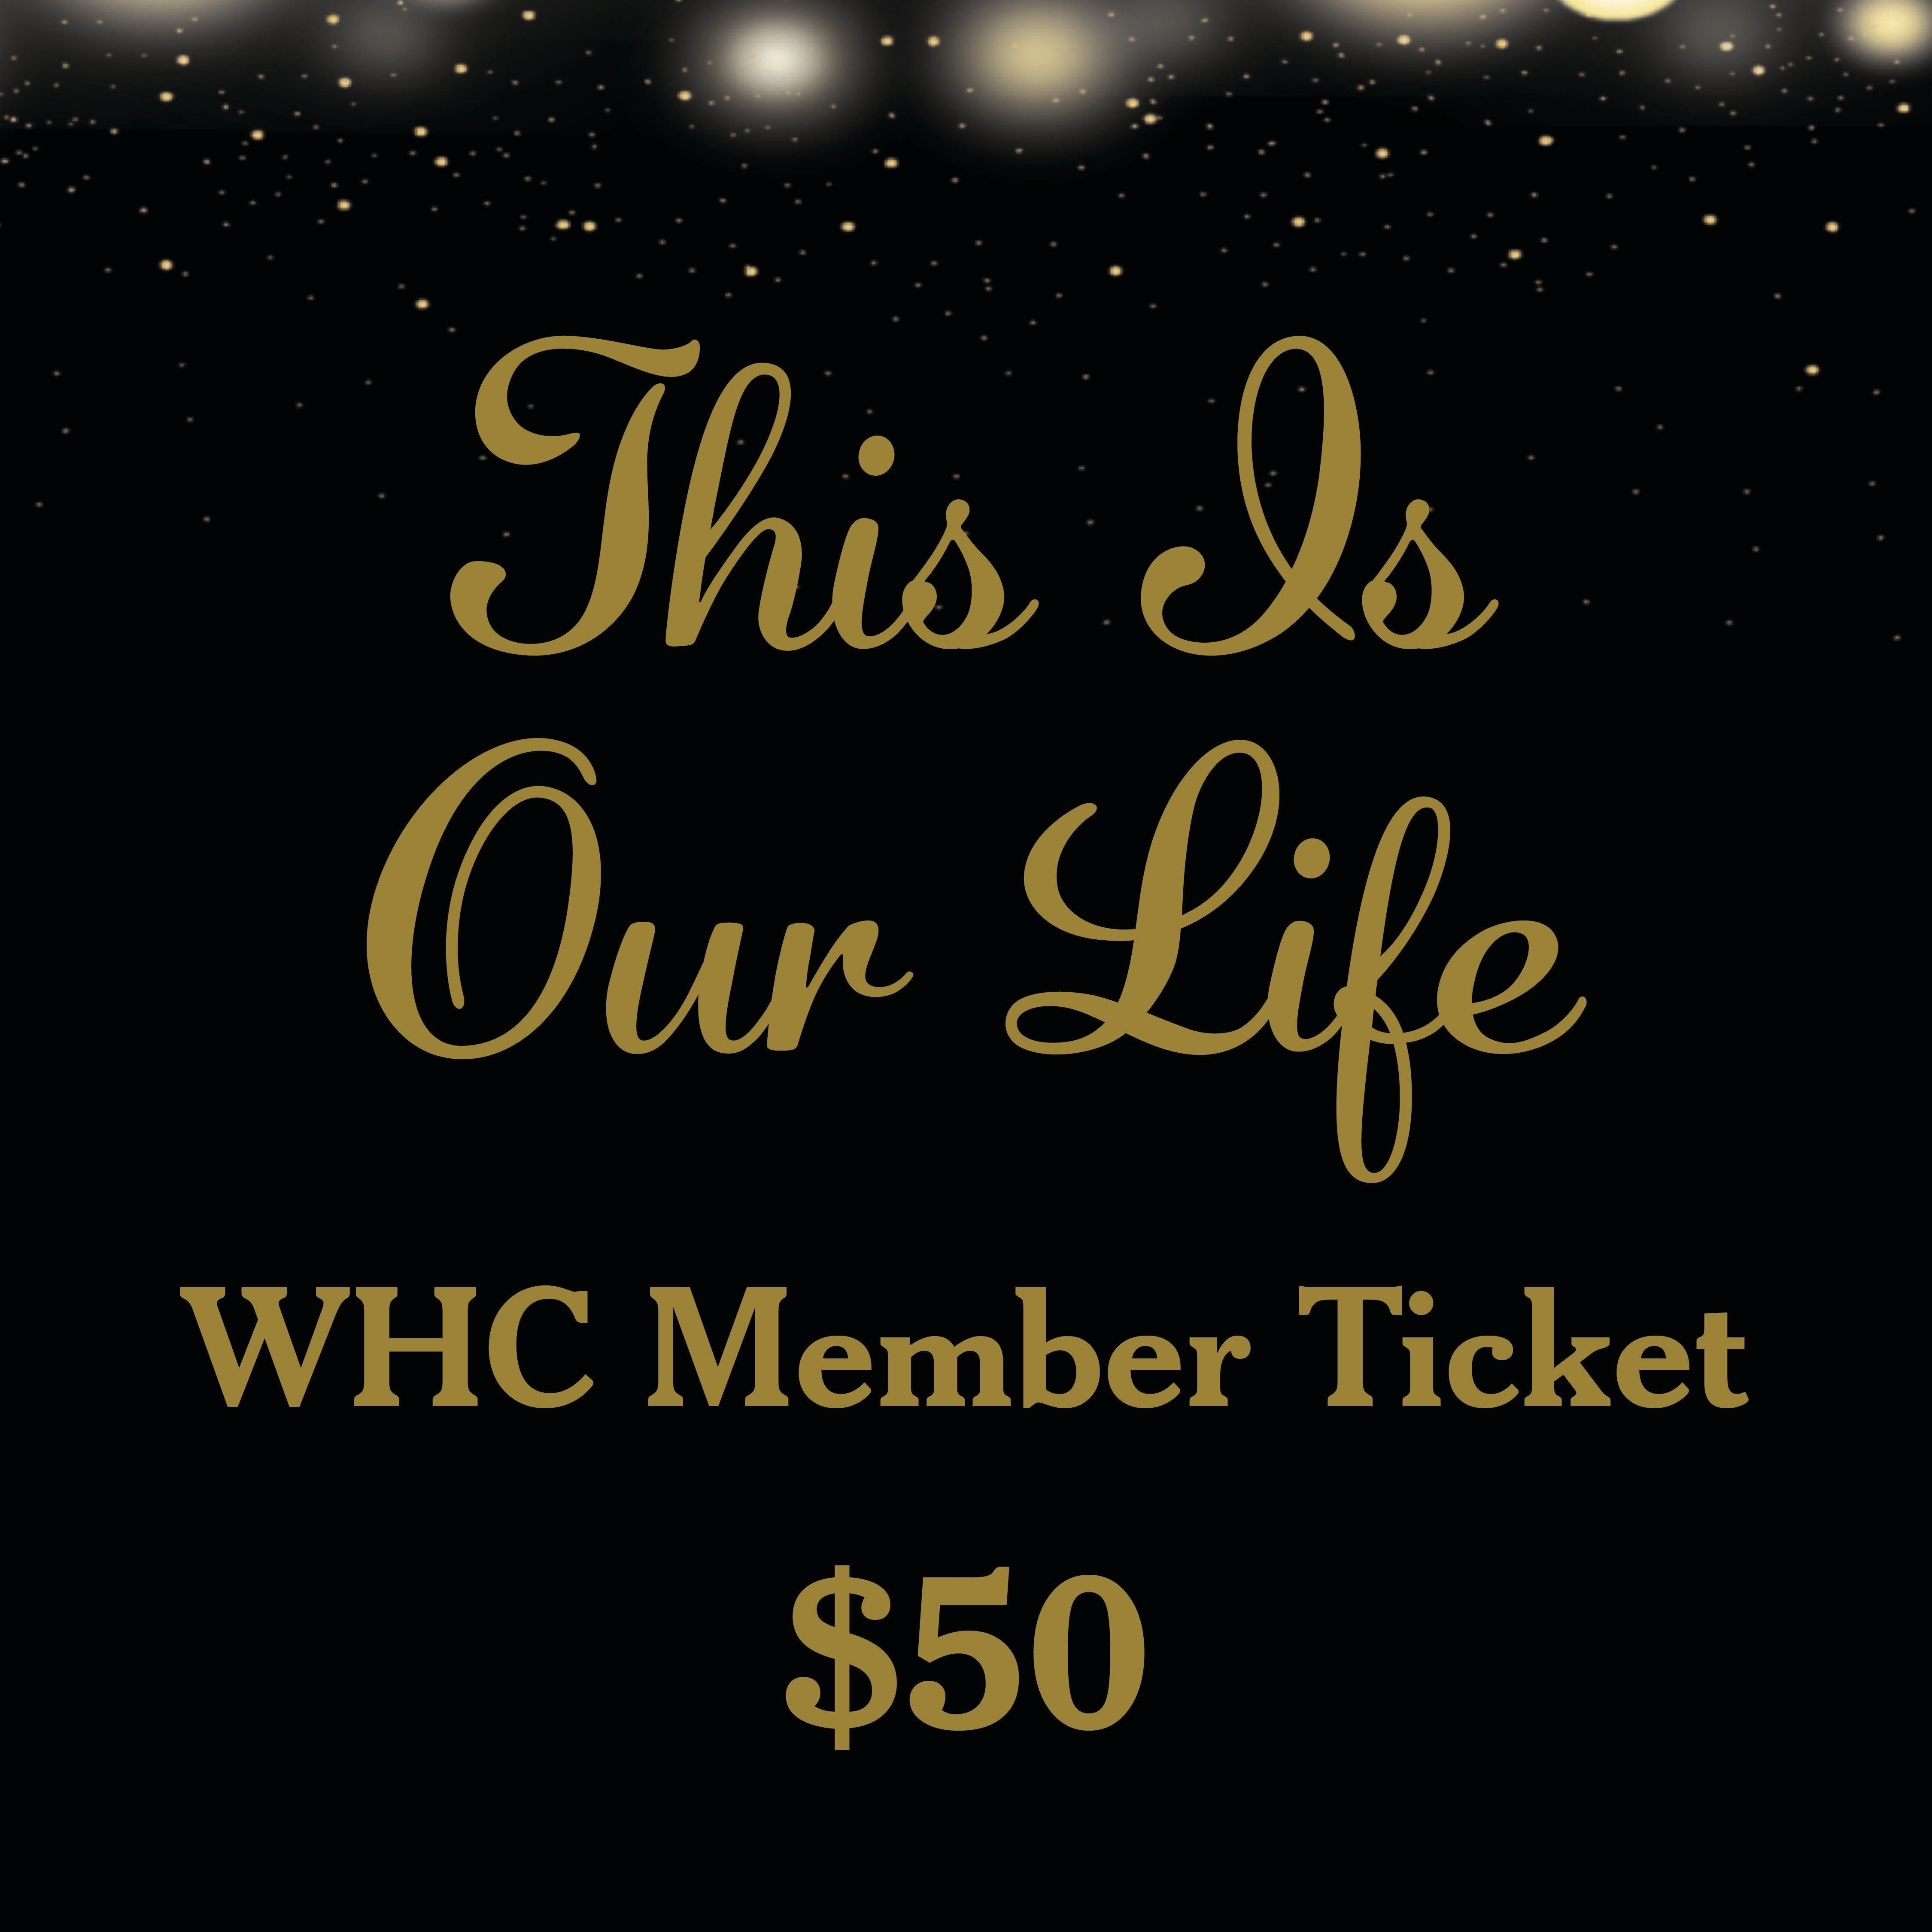 Fall Gala Tickets - WHC Members 00025